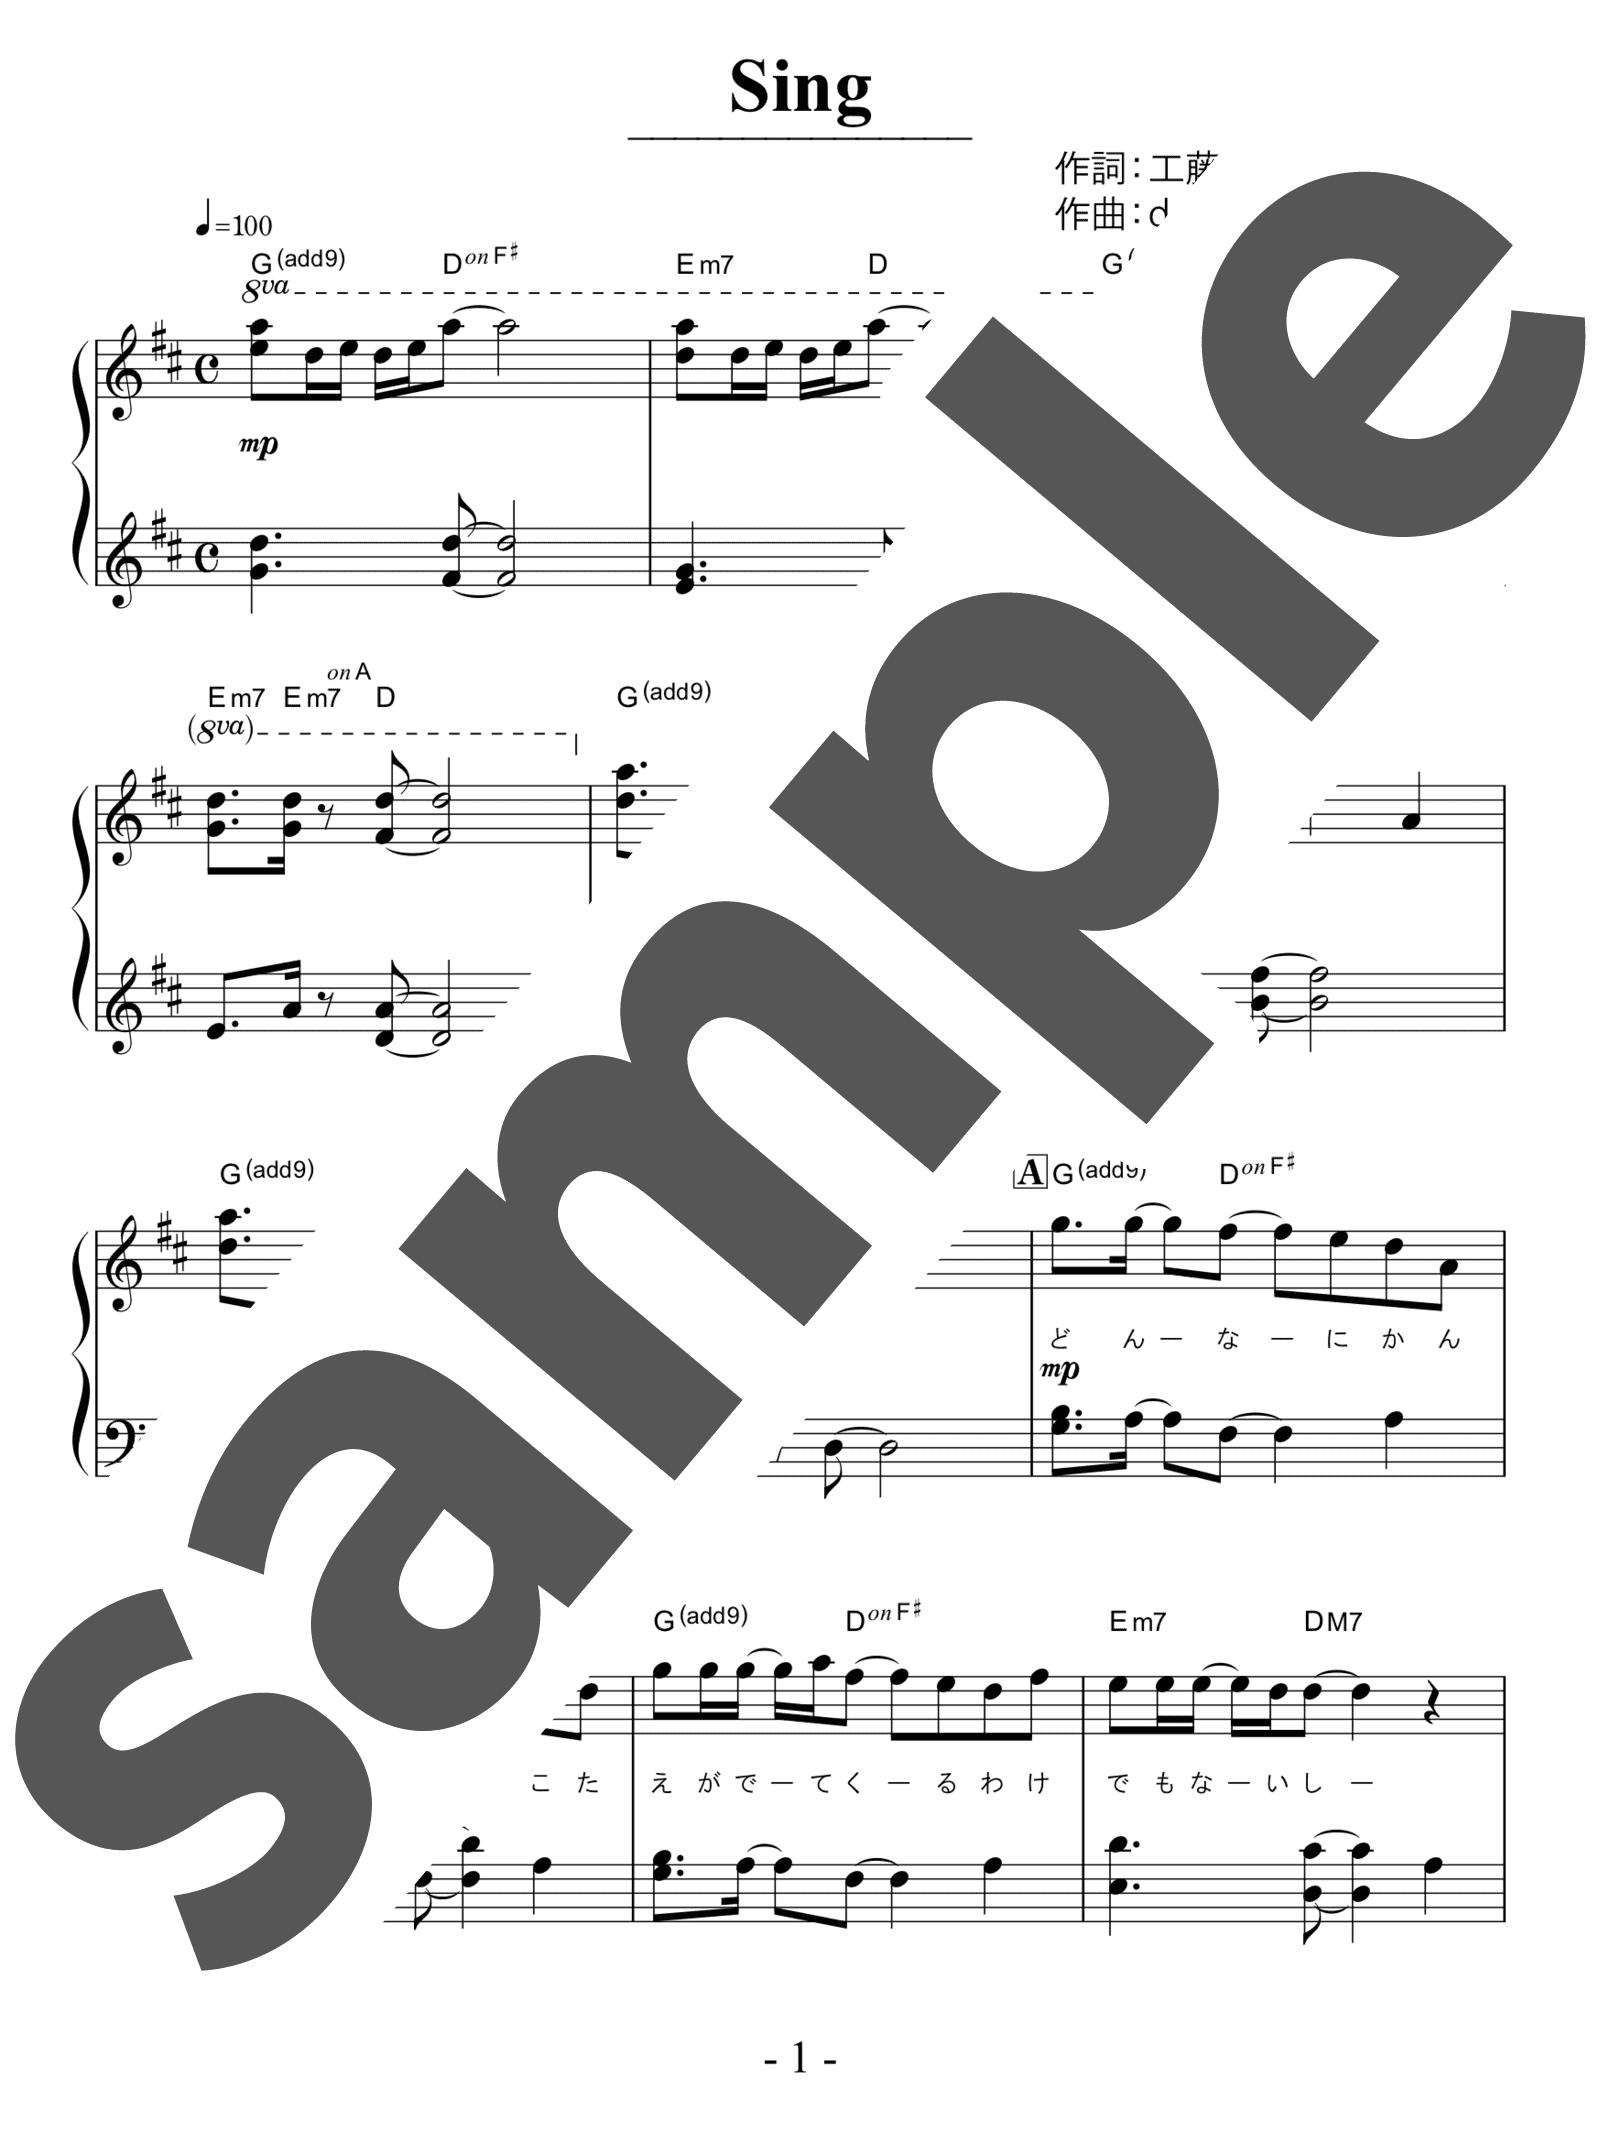 「Sing」のサンプル楽譜